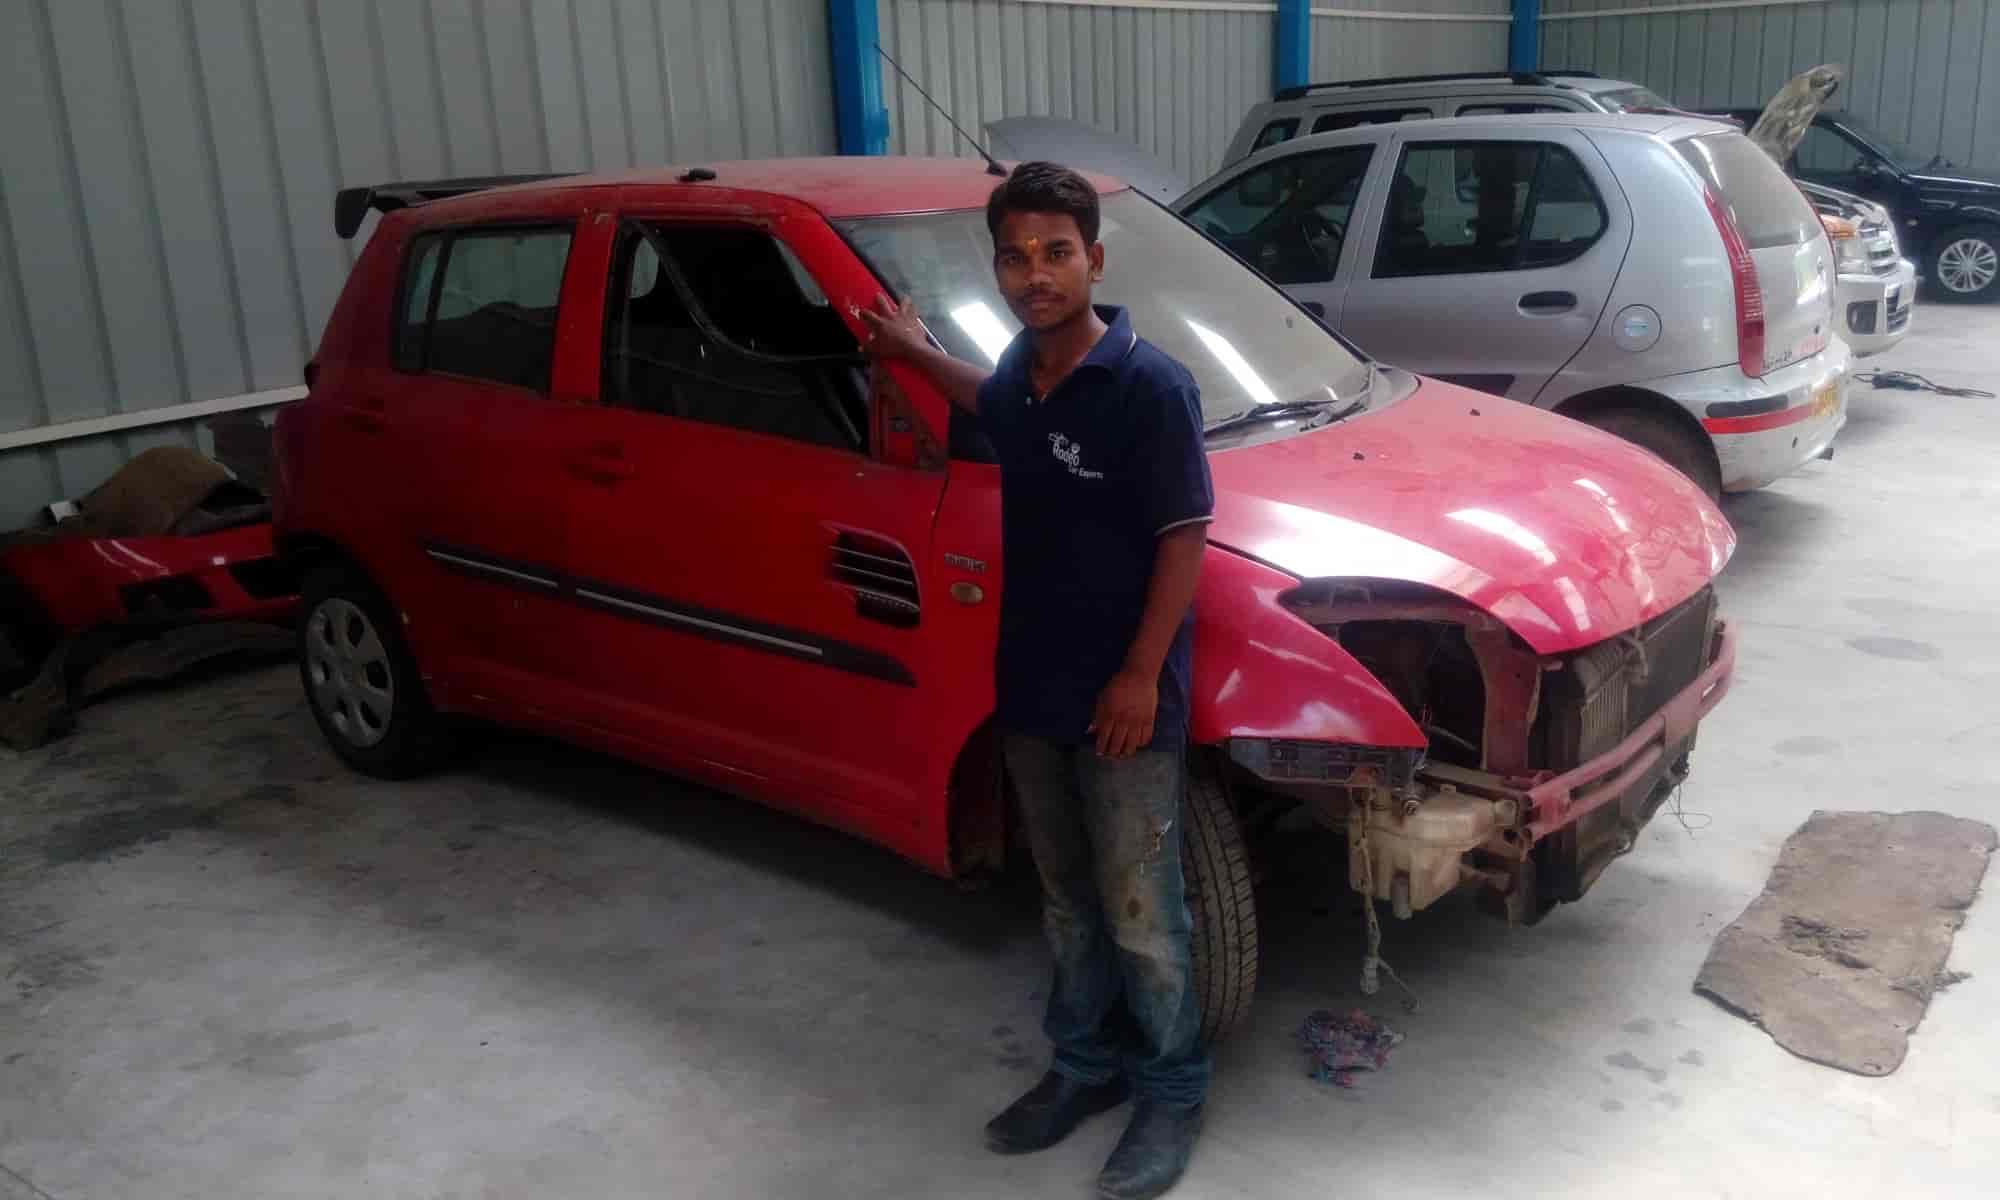 Rodeo Car Experts, Nagaram - Car Repair & Services in Hyderabad